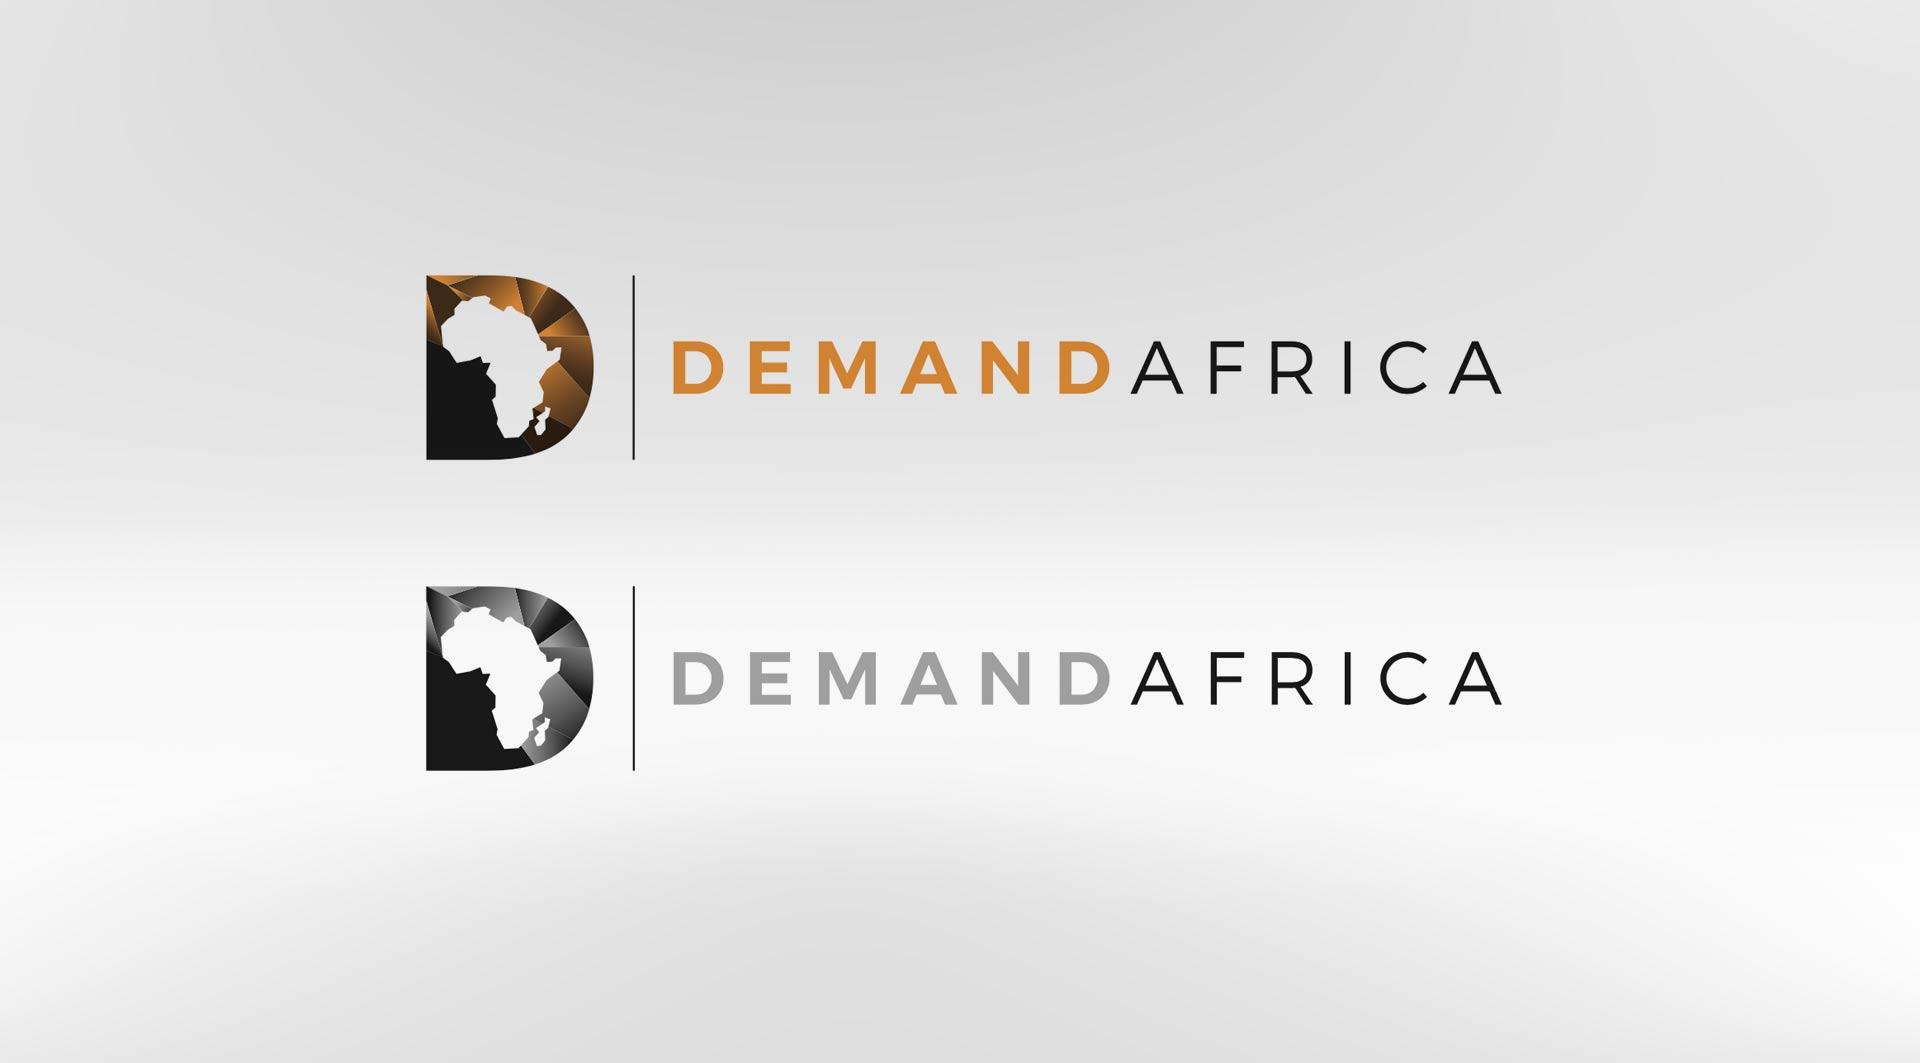 demandafrica_logos_horizontal